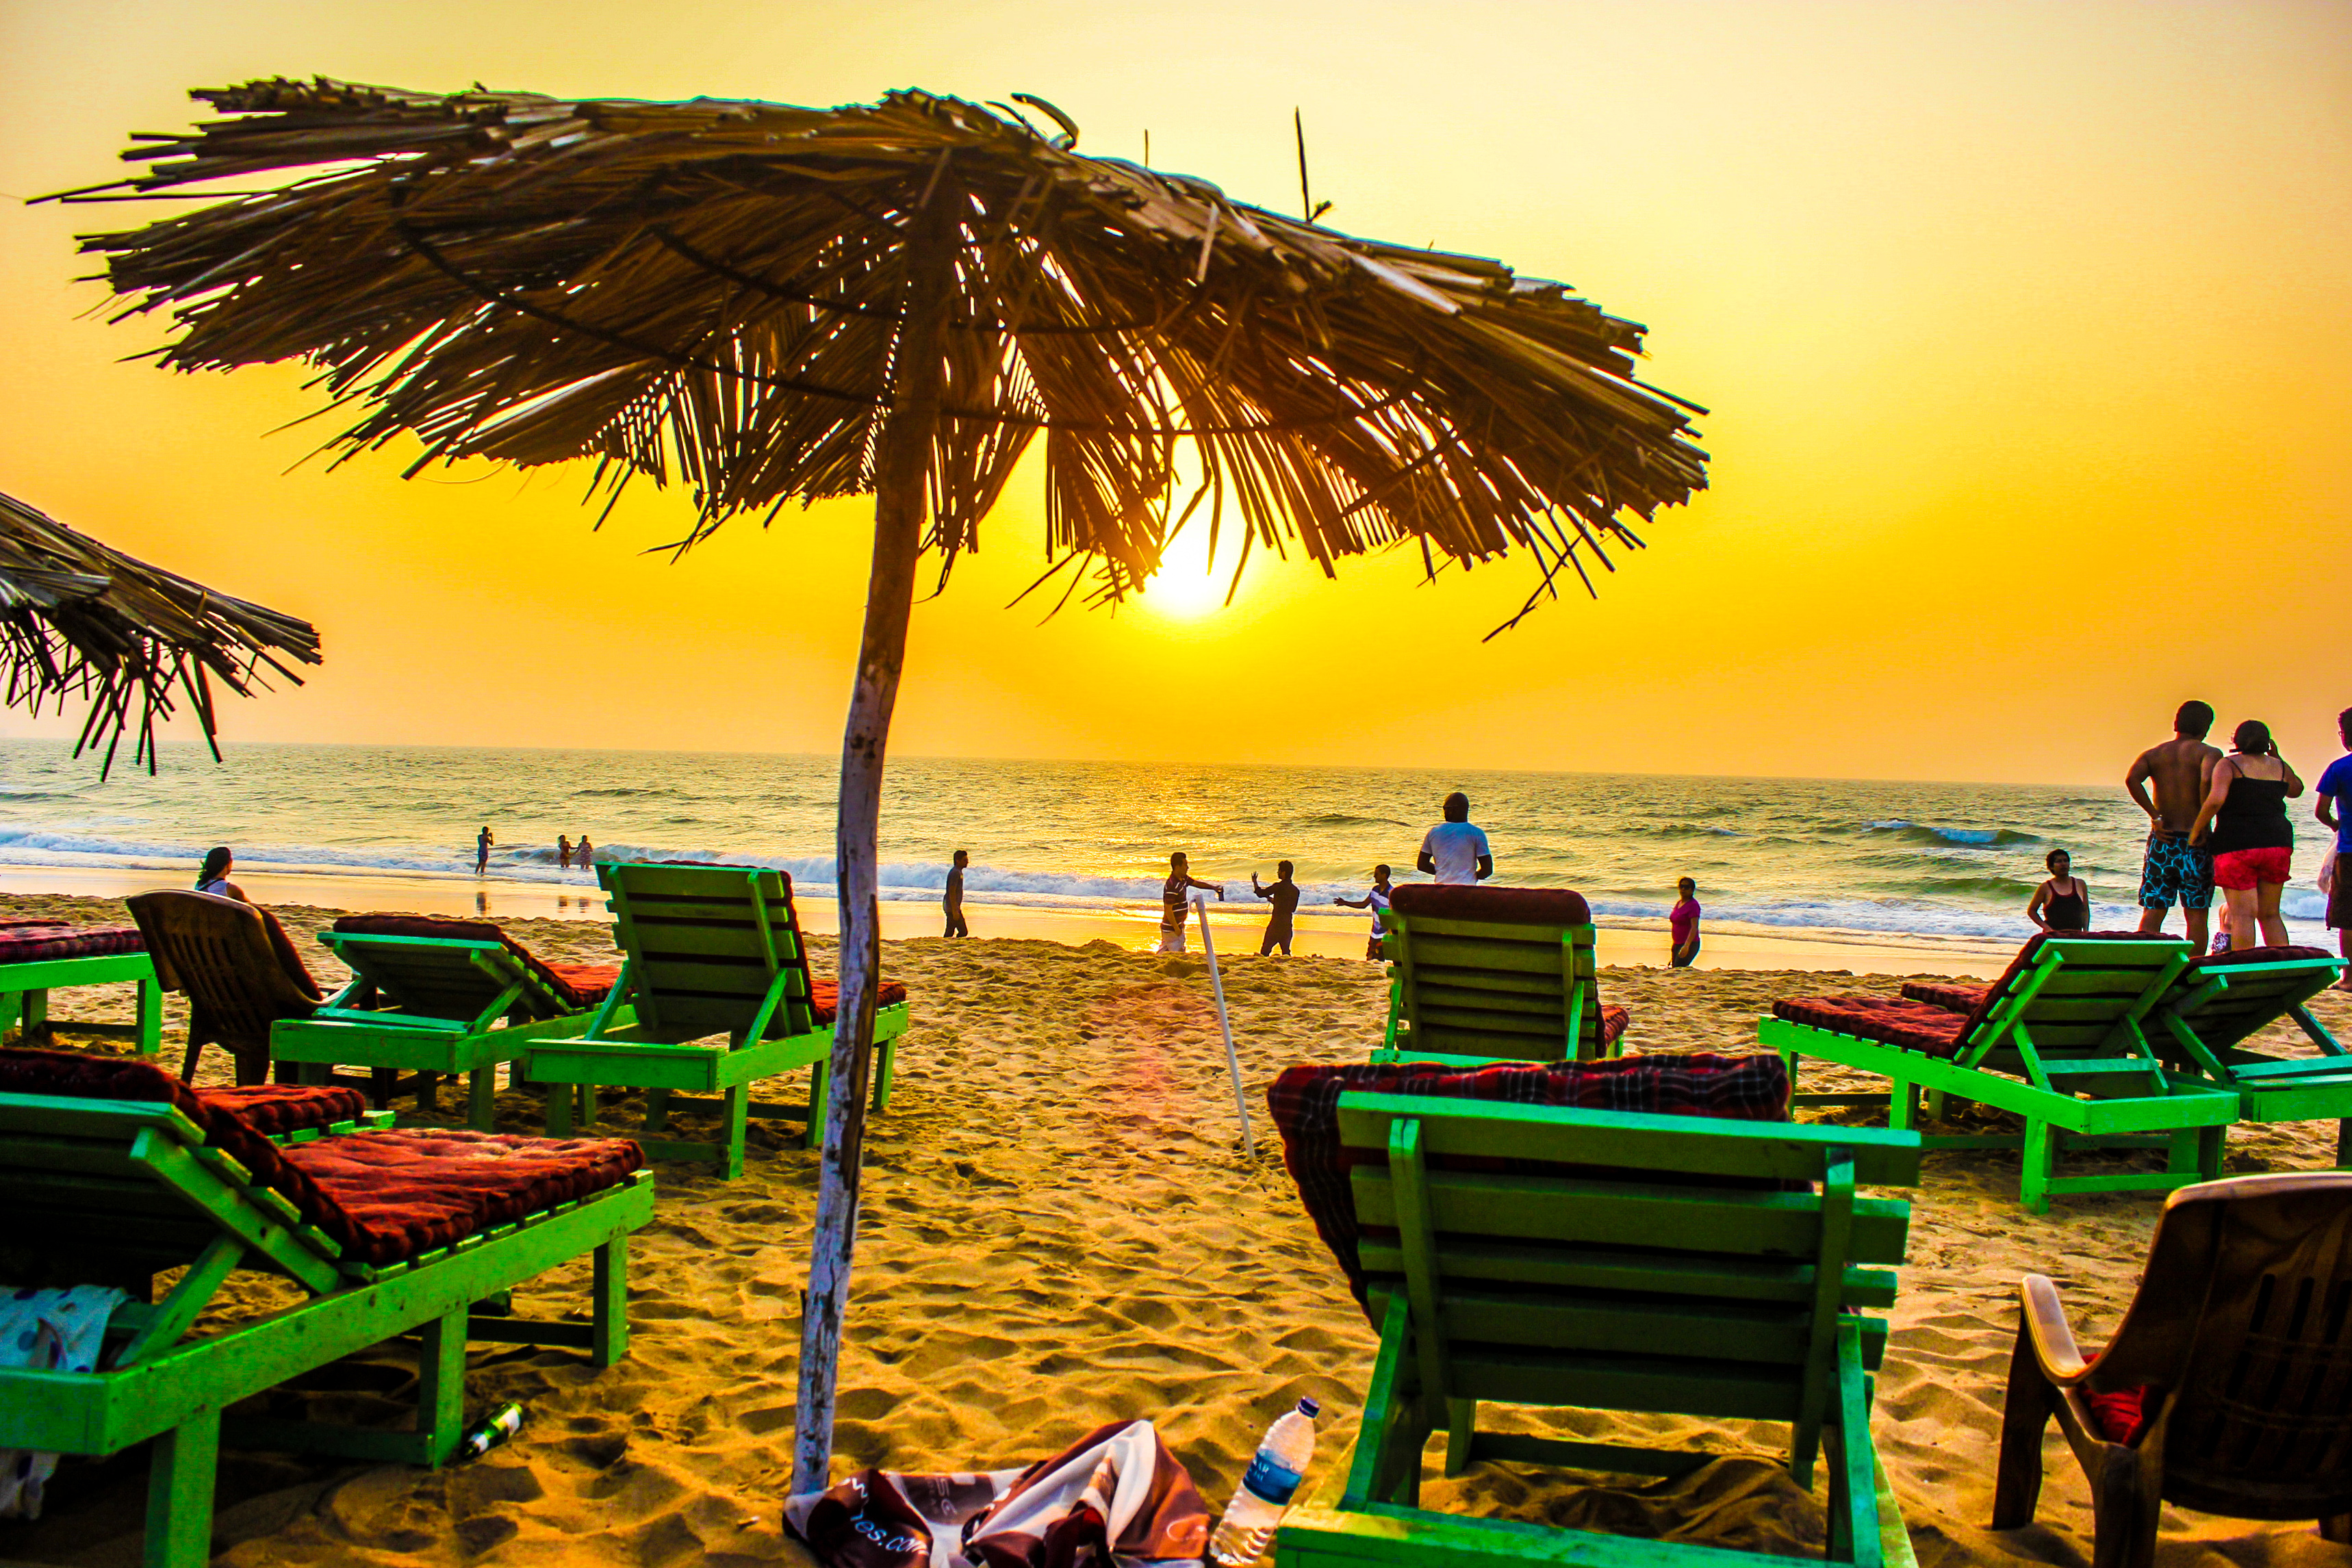 sunset from Candolim Beach